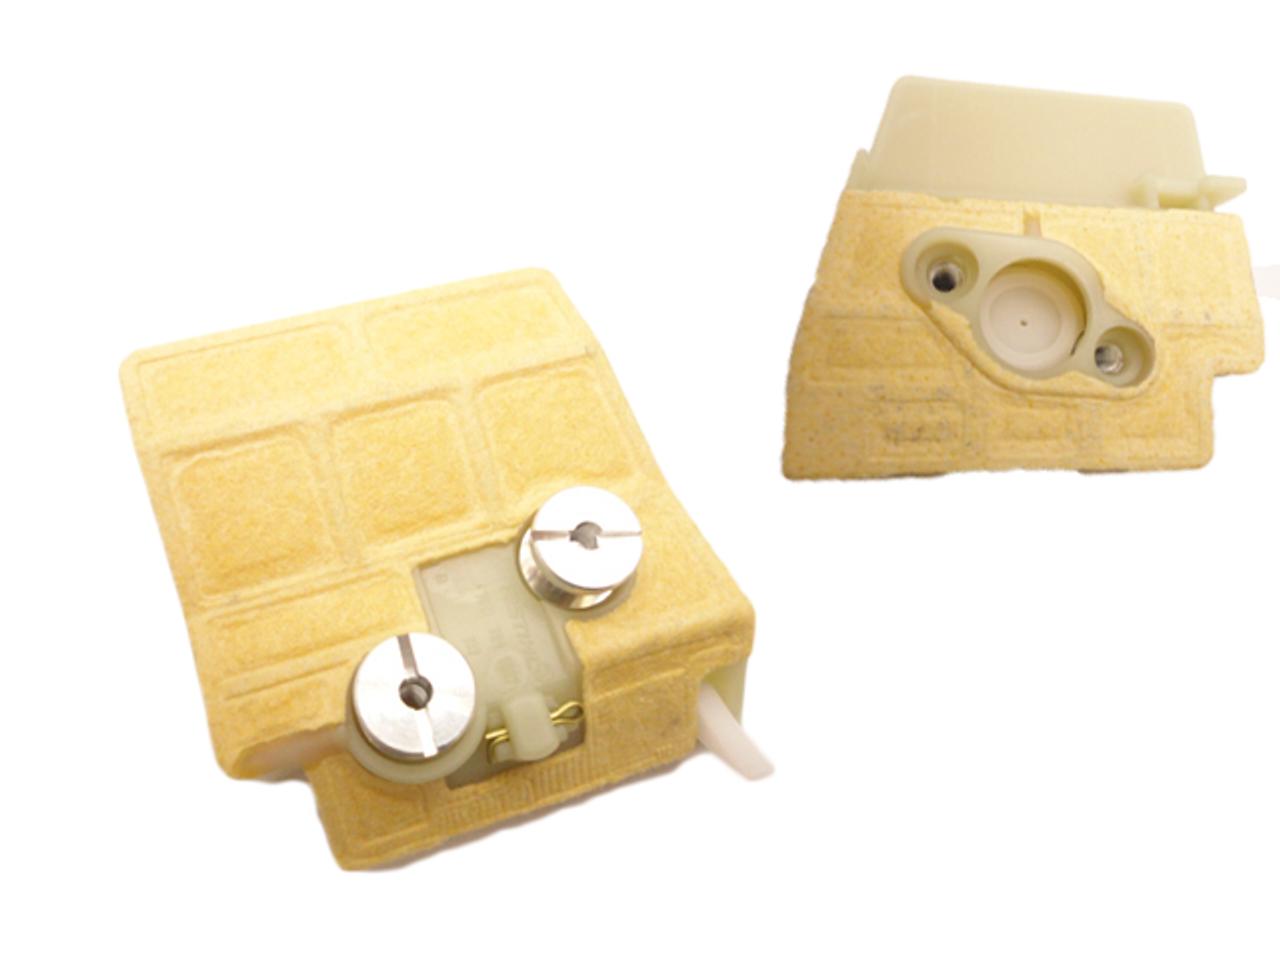 Stihl Genuine OEM 024 Air Filter Cartridge 024AV Super WB 1121-120-1625 #GM-8BB1